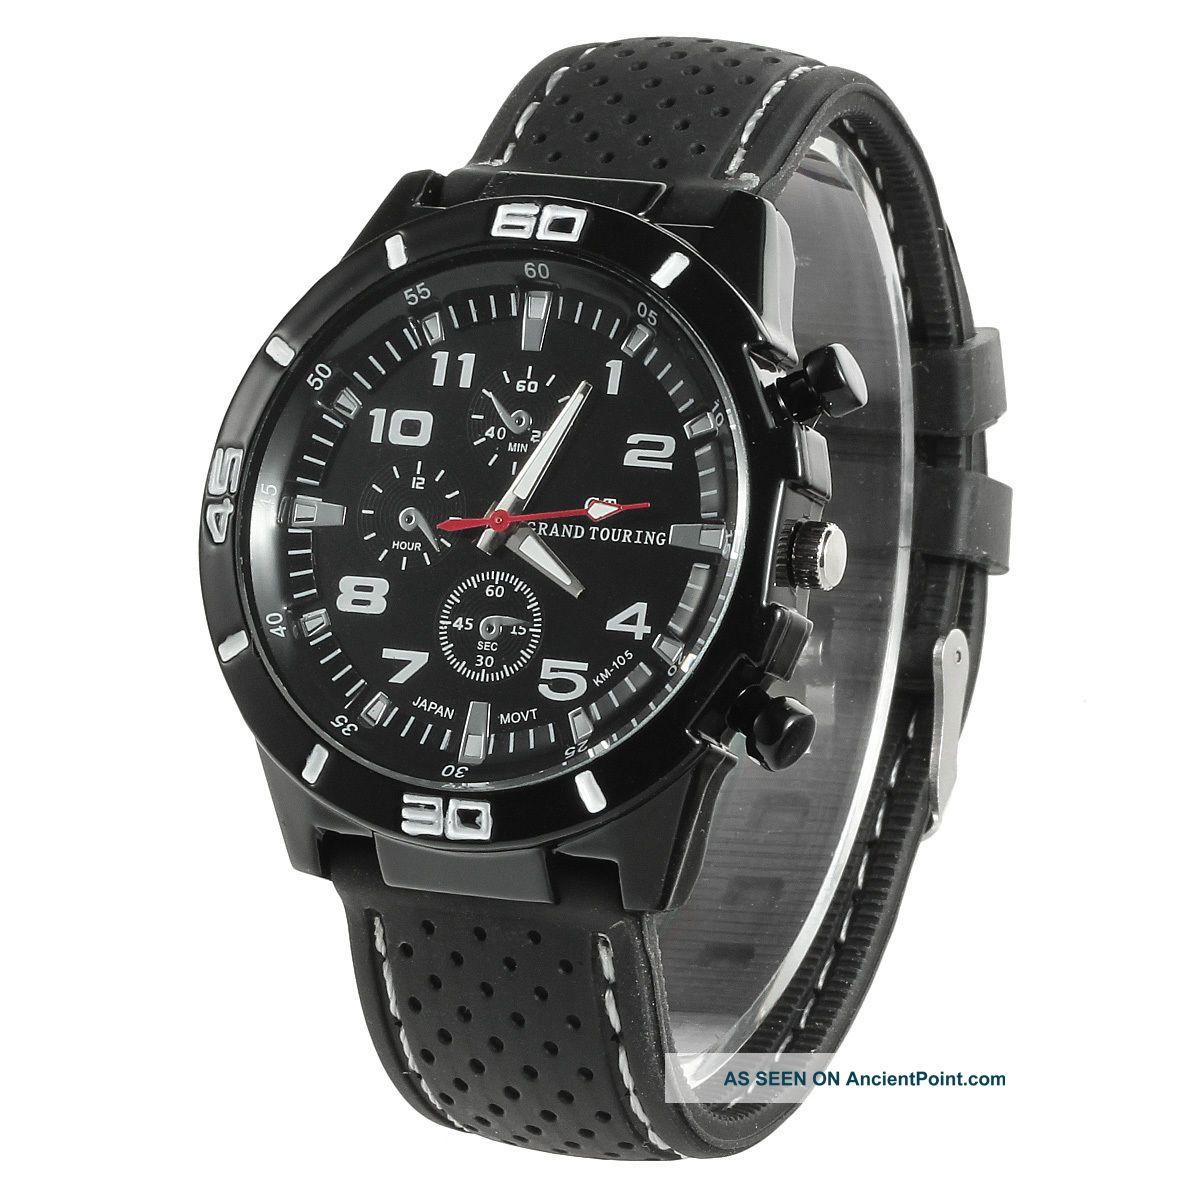 Men ' S Fashion Silicone Rubber Band Sport Analog Quartz Wrist Watch - Black White See more Men's Fashion Silicone Rubber Band Sport Analo... photo